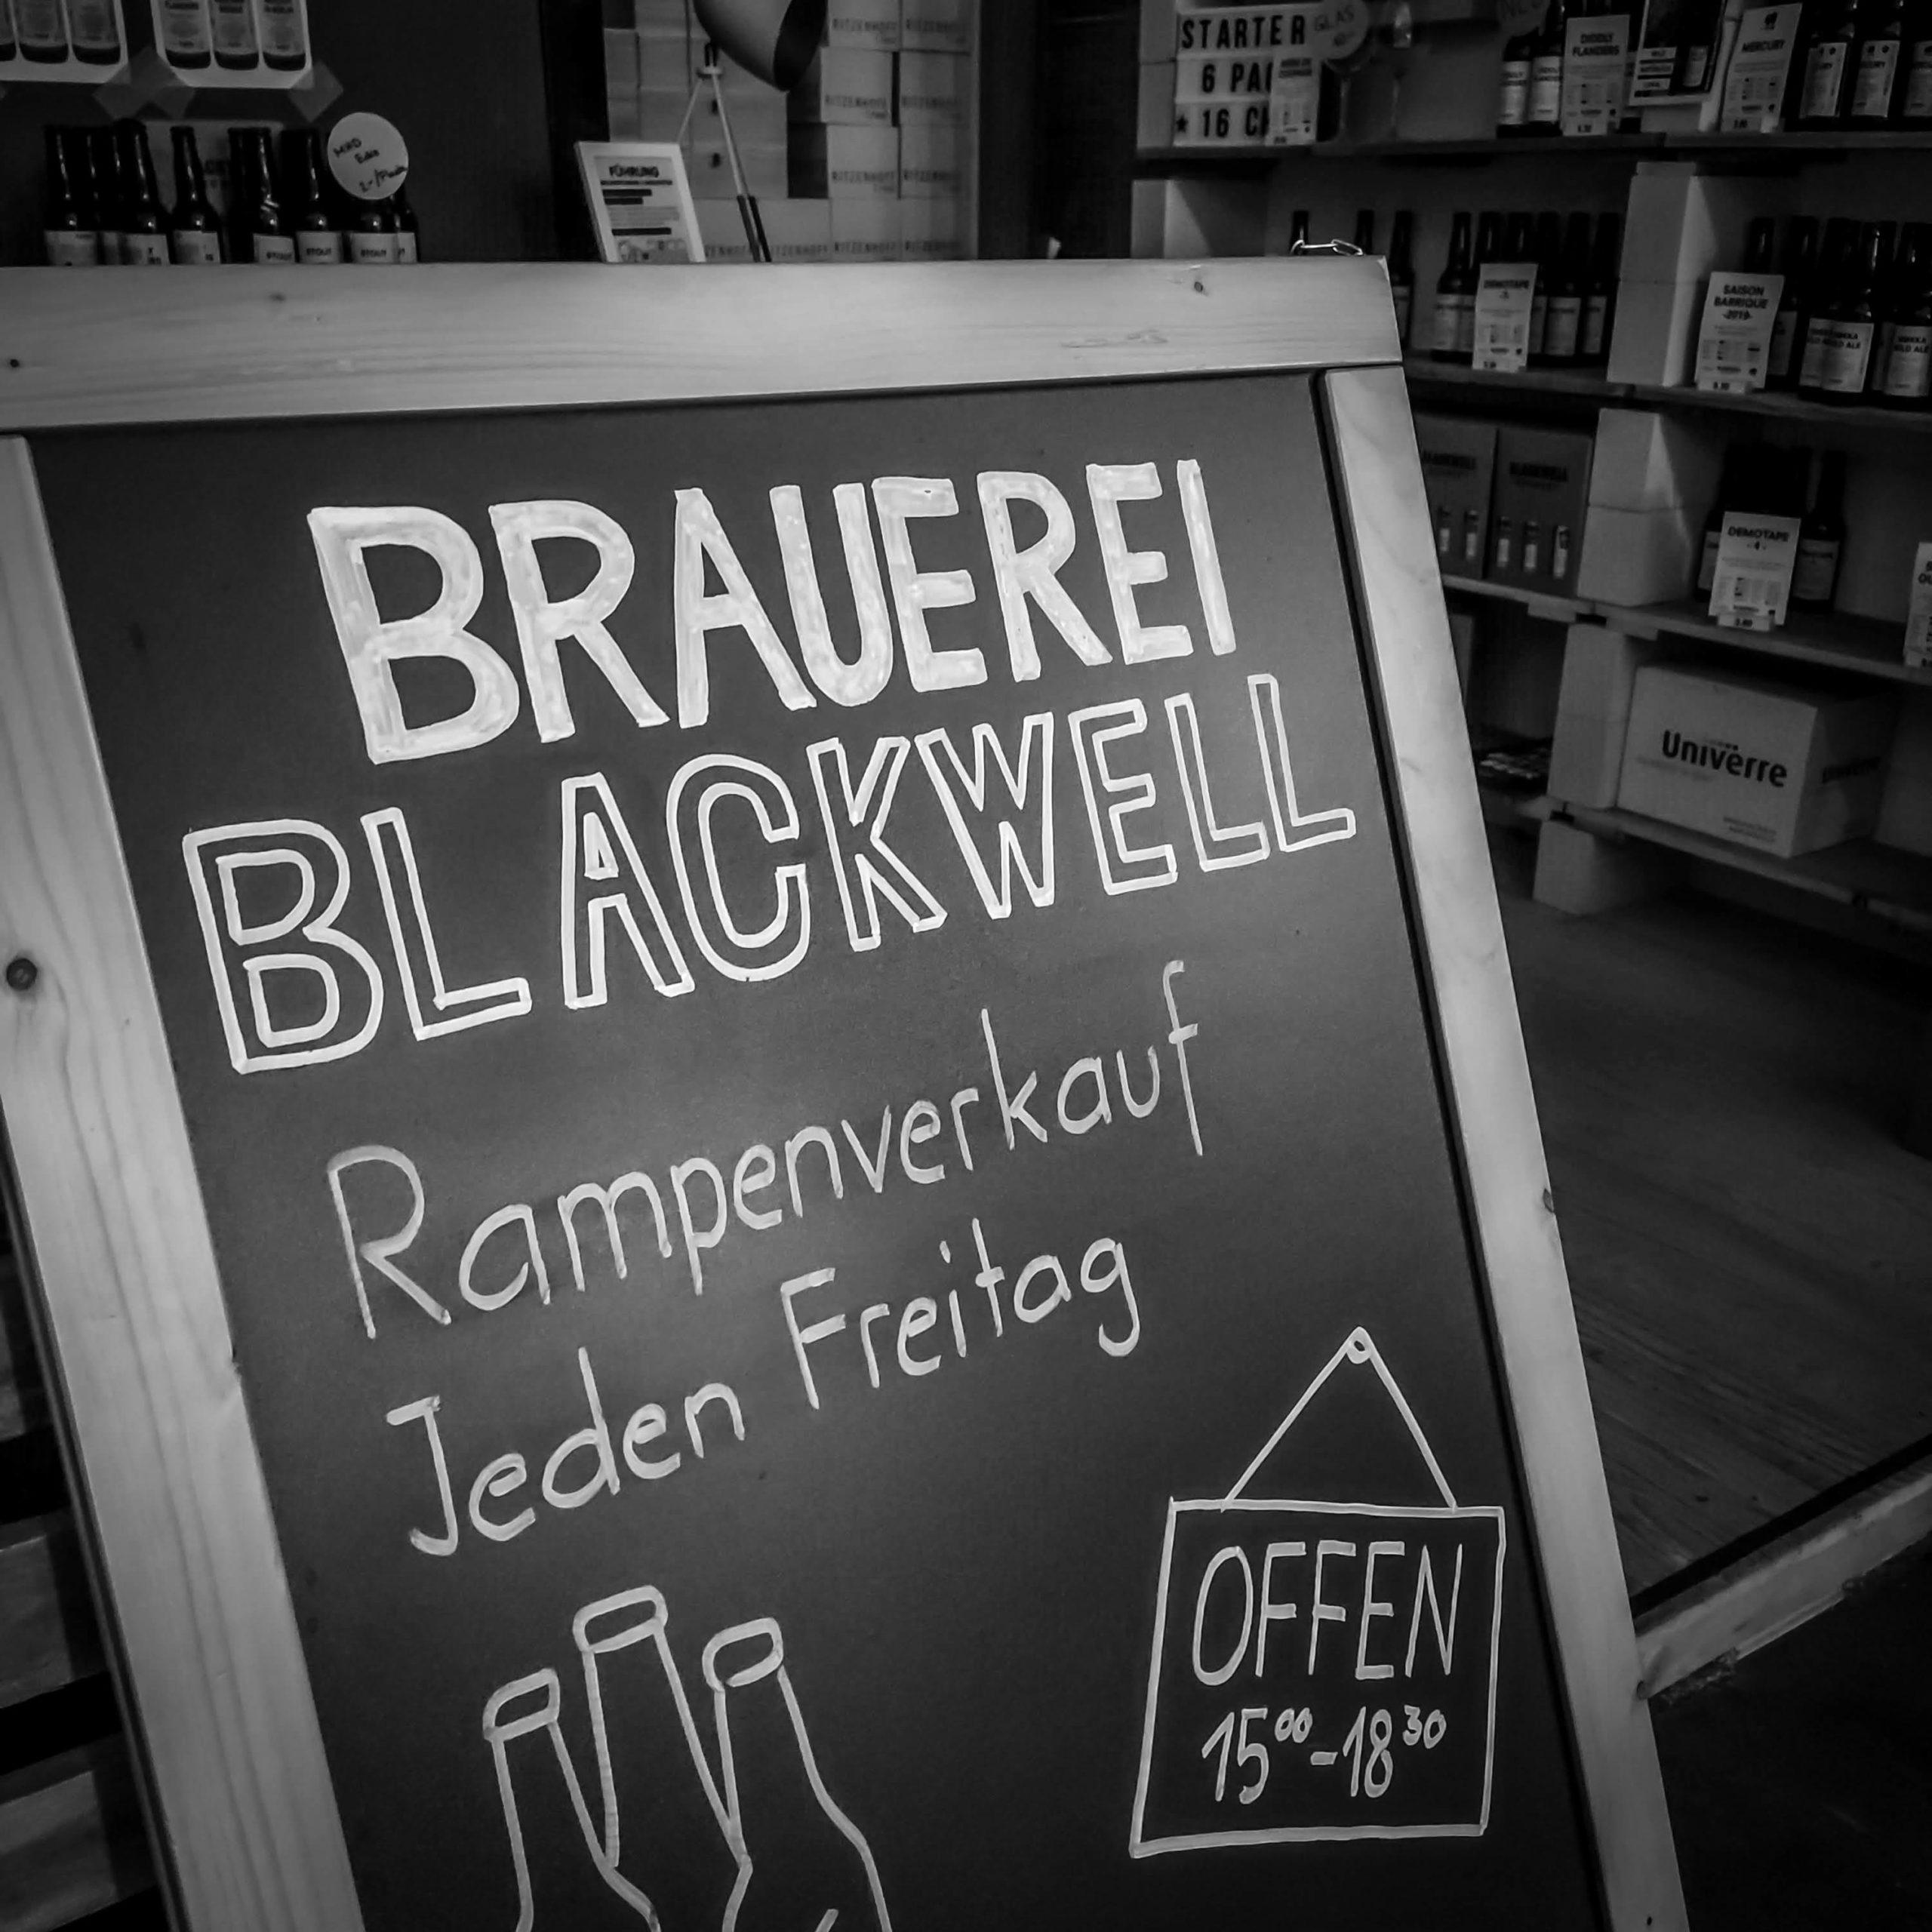 https://blackwellbrewery.ch/wp-content/uploads/2021/04/rampenverkauf_heute-scaled.jpg